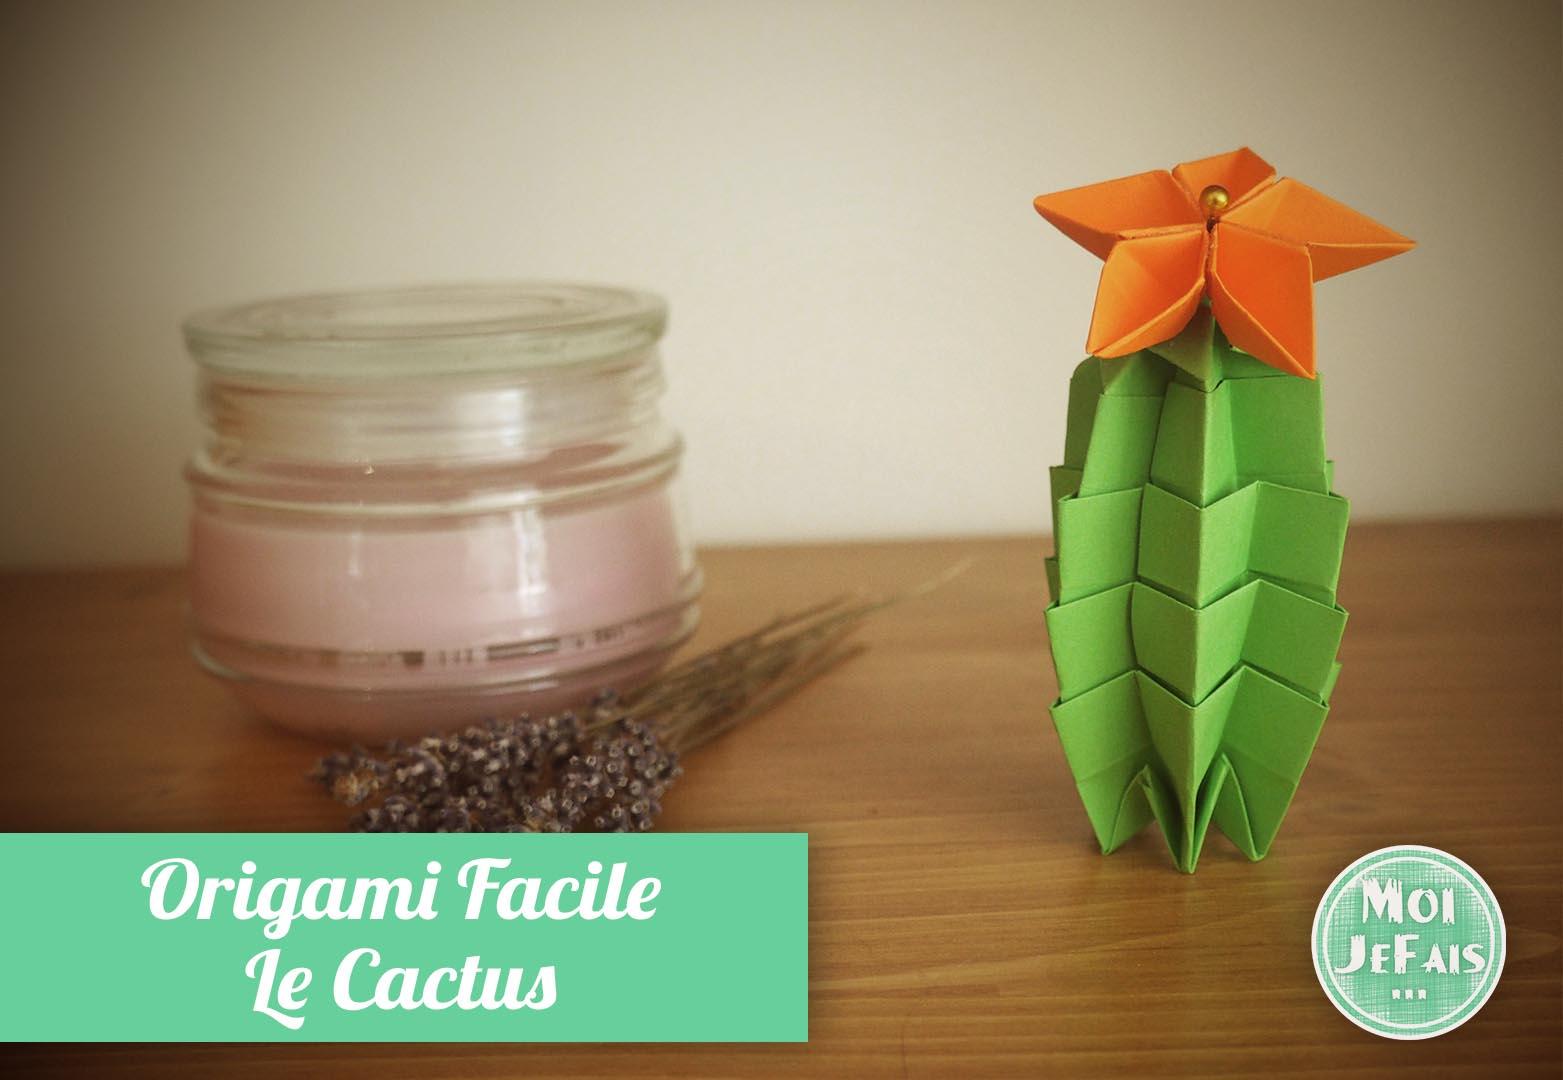 Origami Cactus Diy - Les Origamis Faciles concernant Origami Facile A Faire En Français